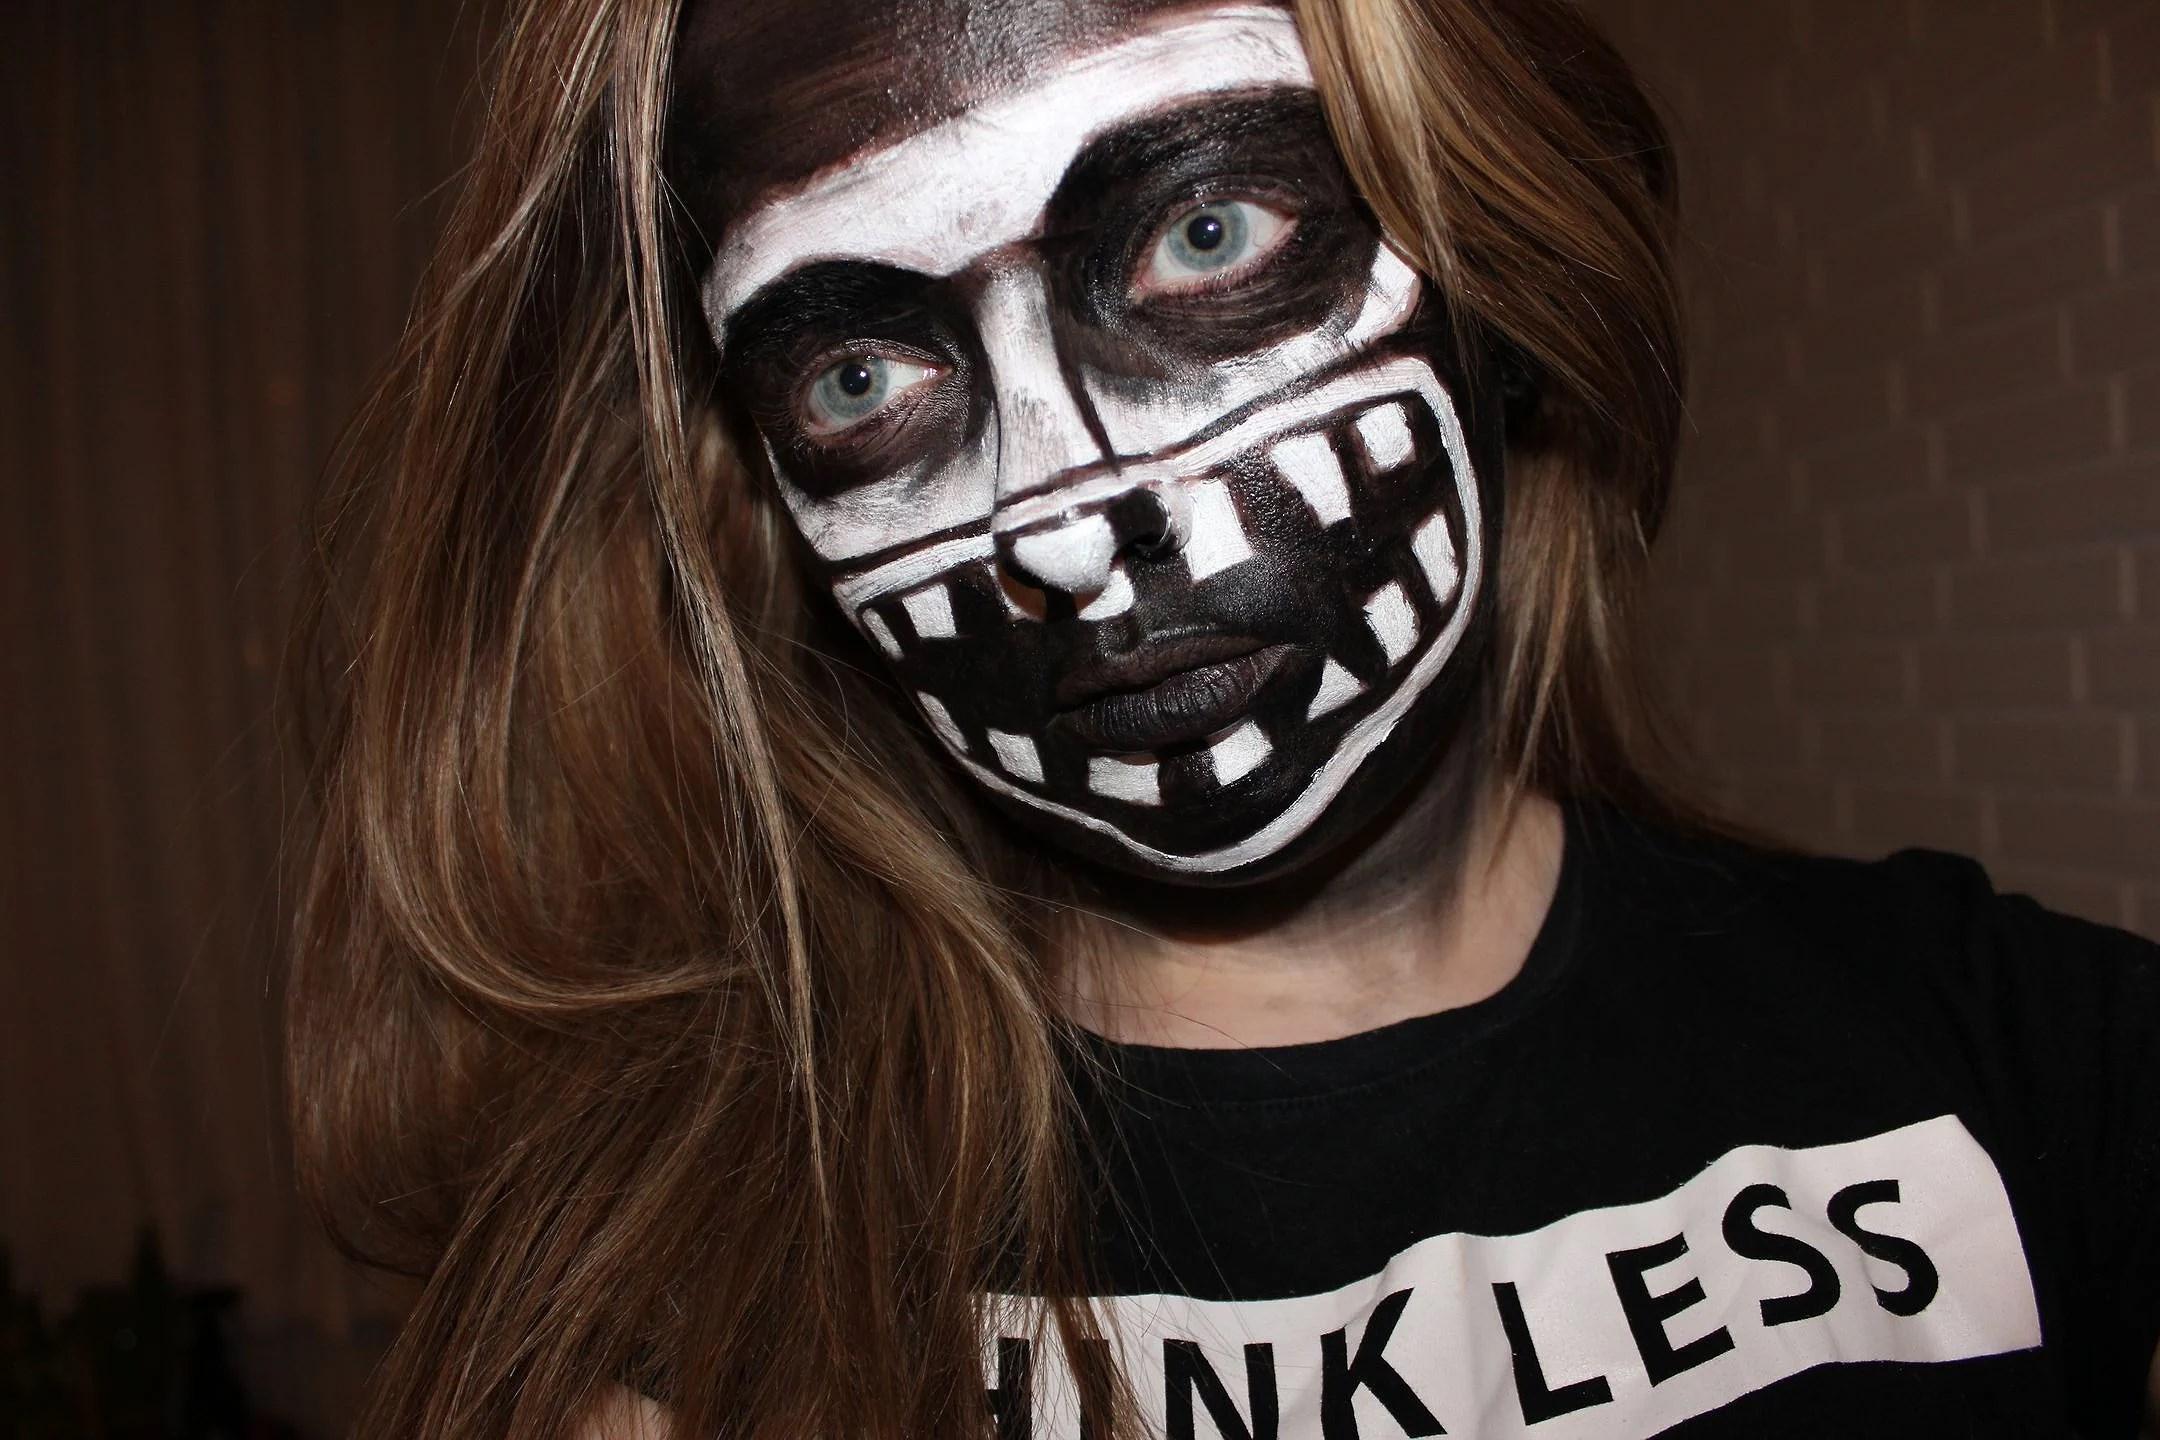 Halloween makeup #1 // The Babadook